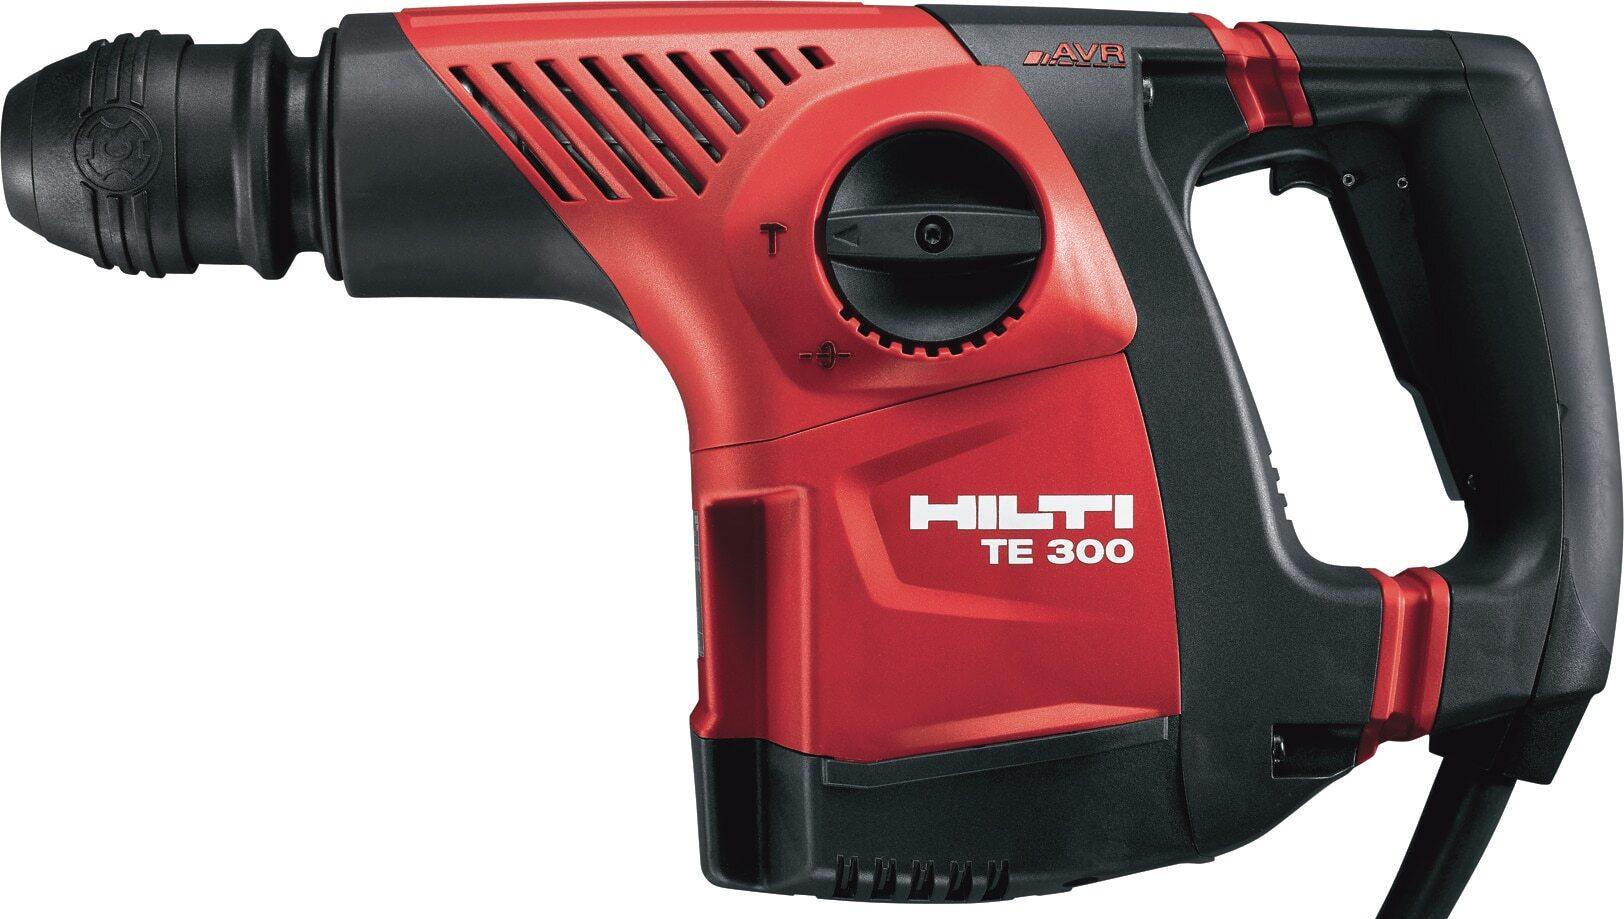 Hilti TE 300-AVR Wall Breaker